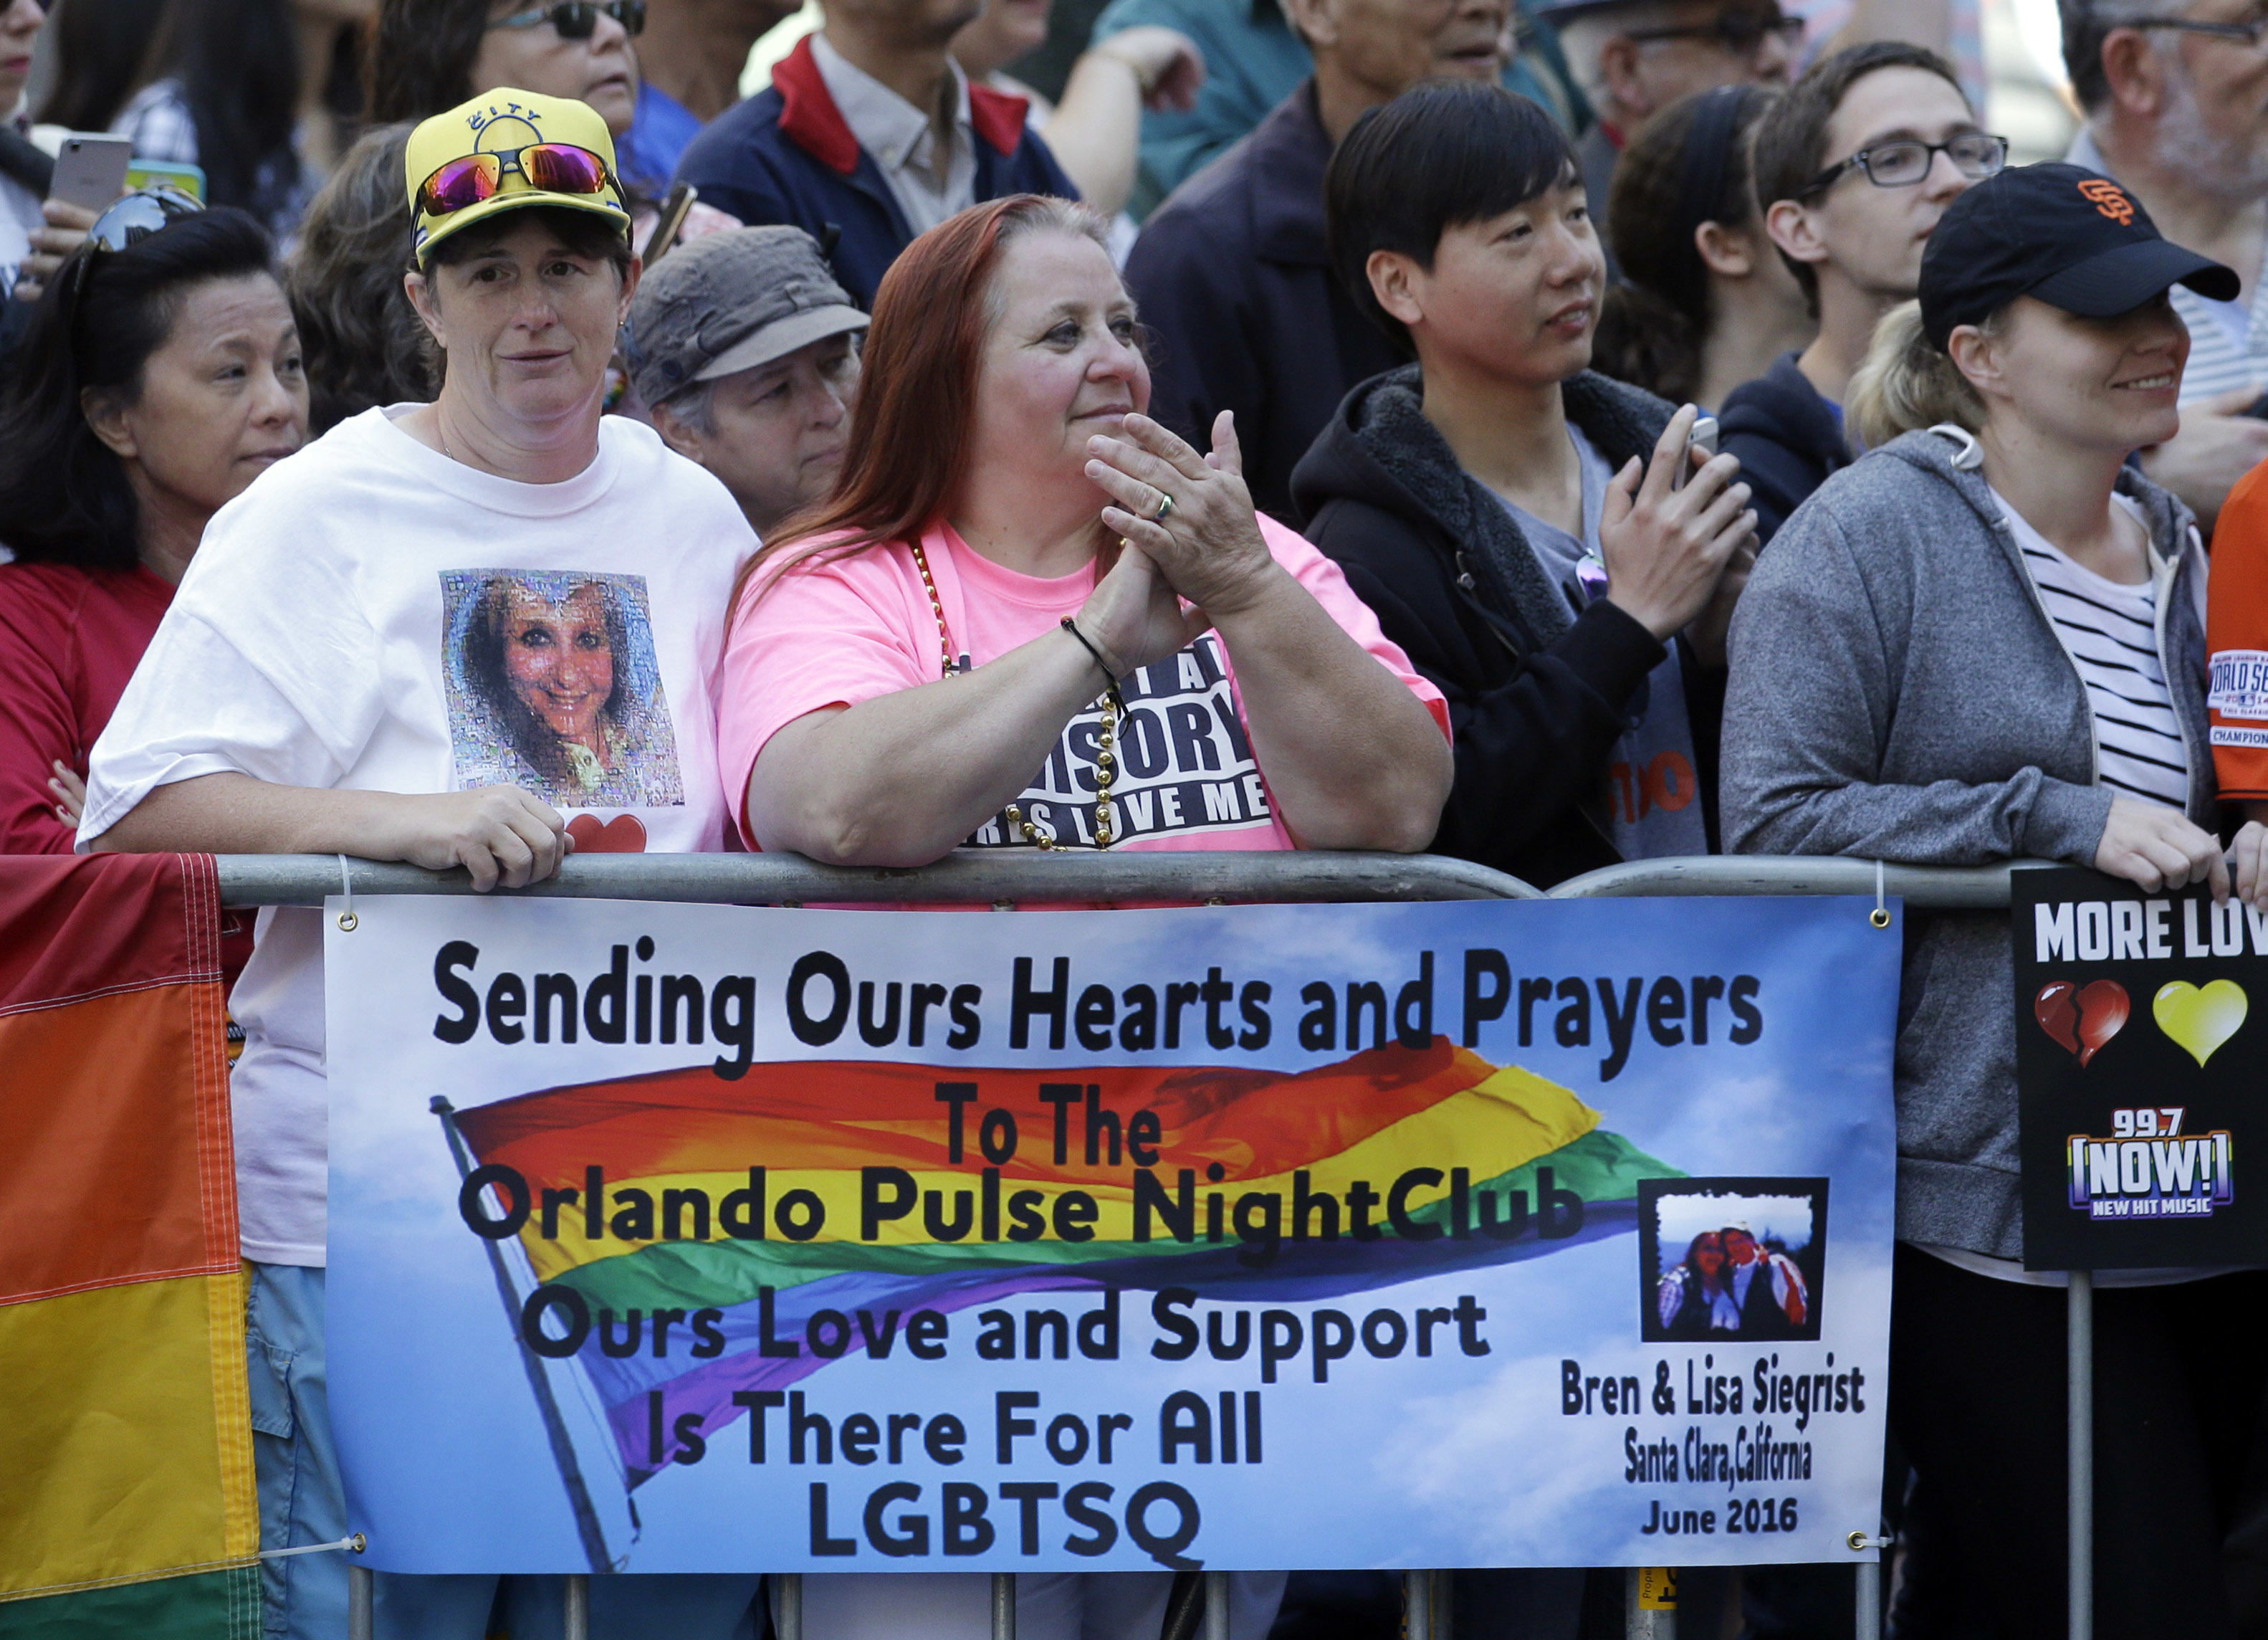 Gay Pride Parades, San Francisco, USA - 26 Jun 2016